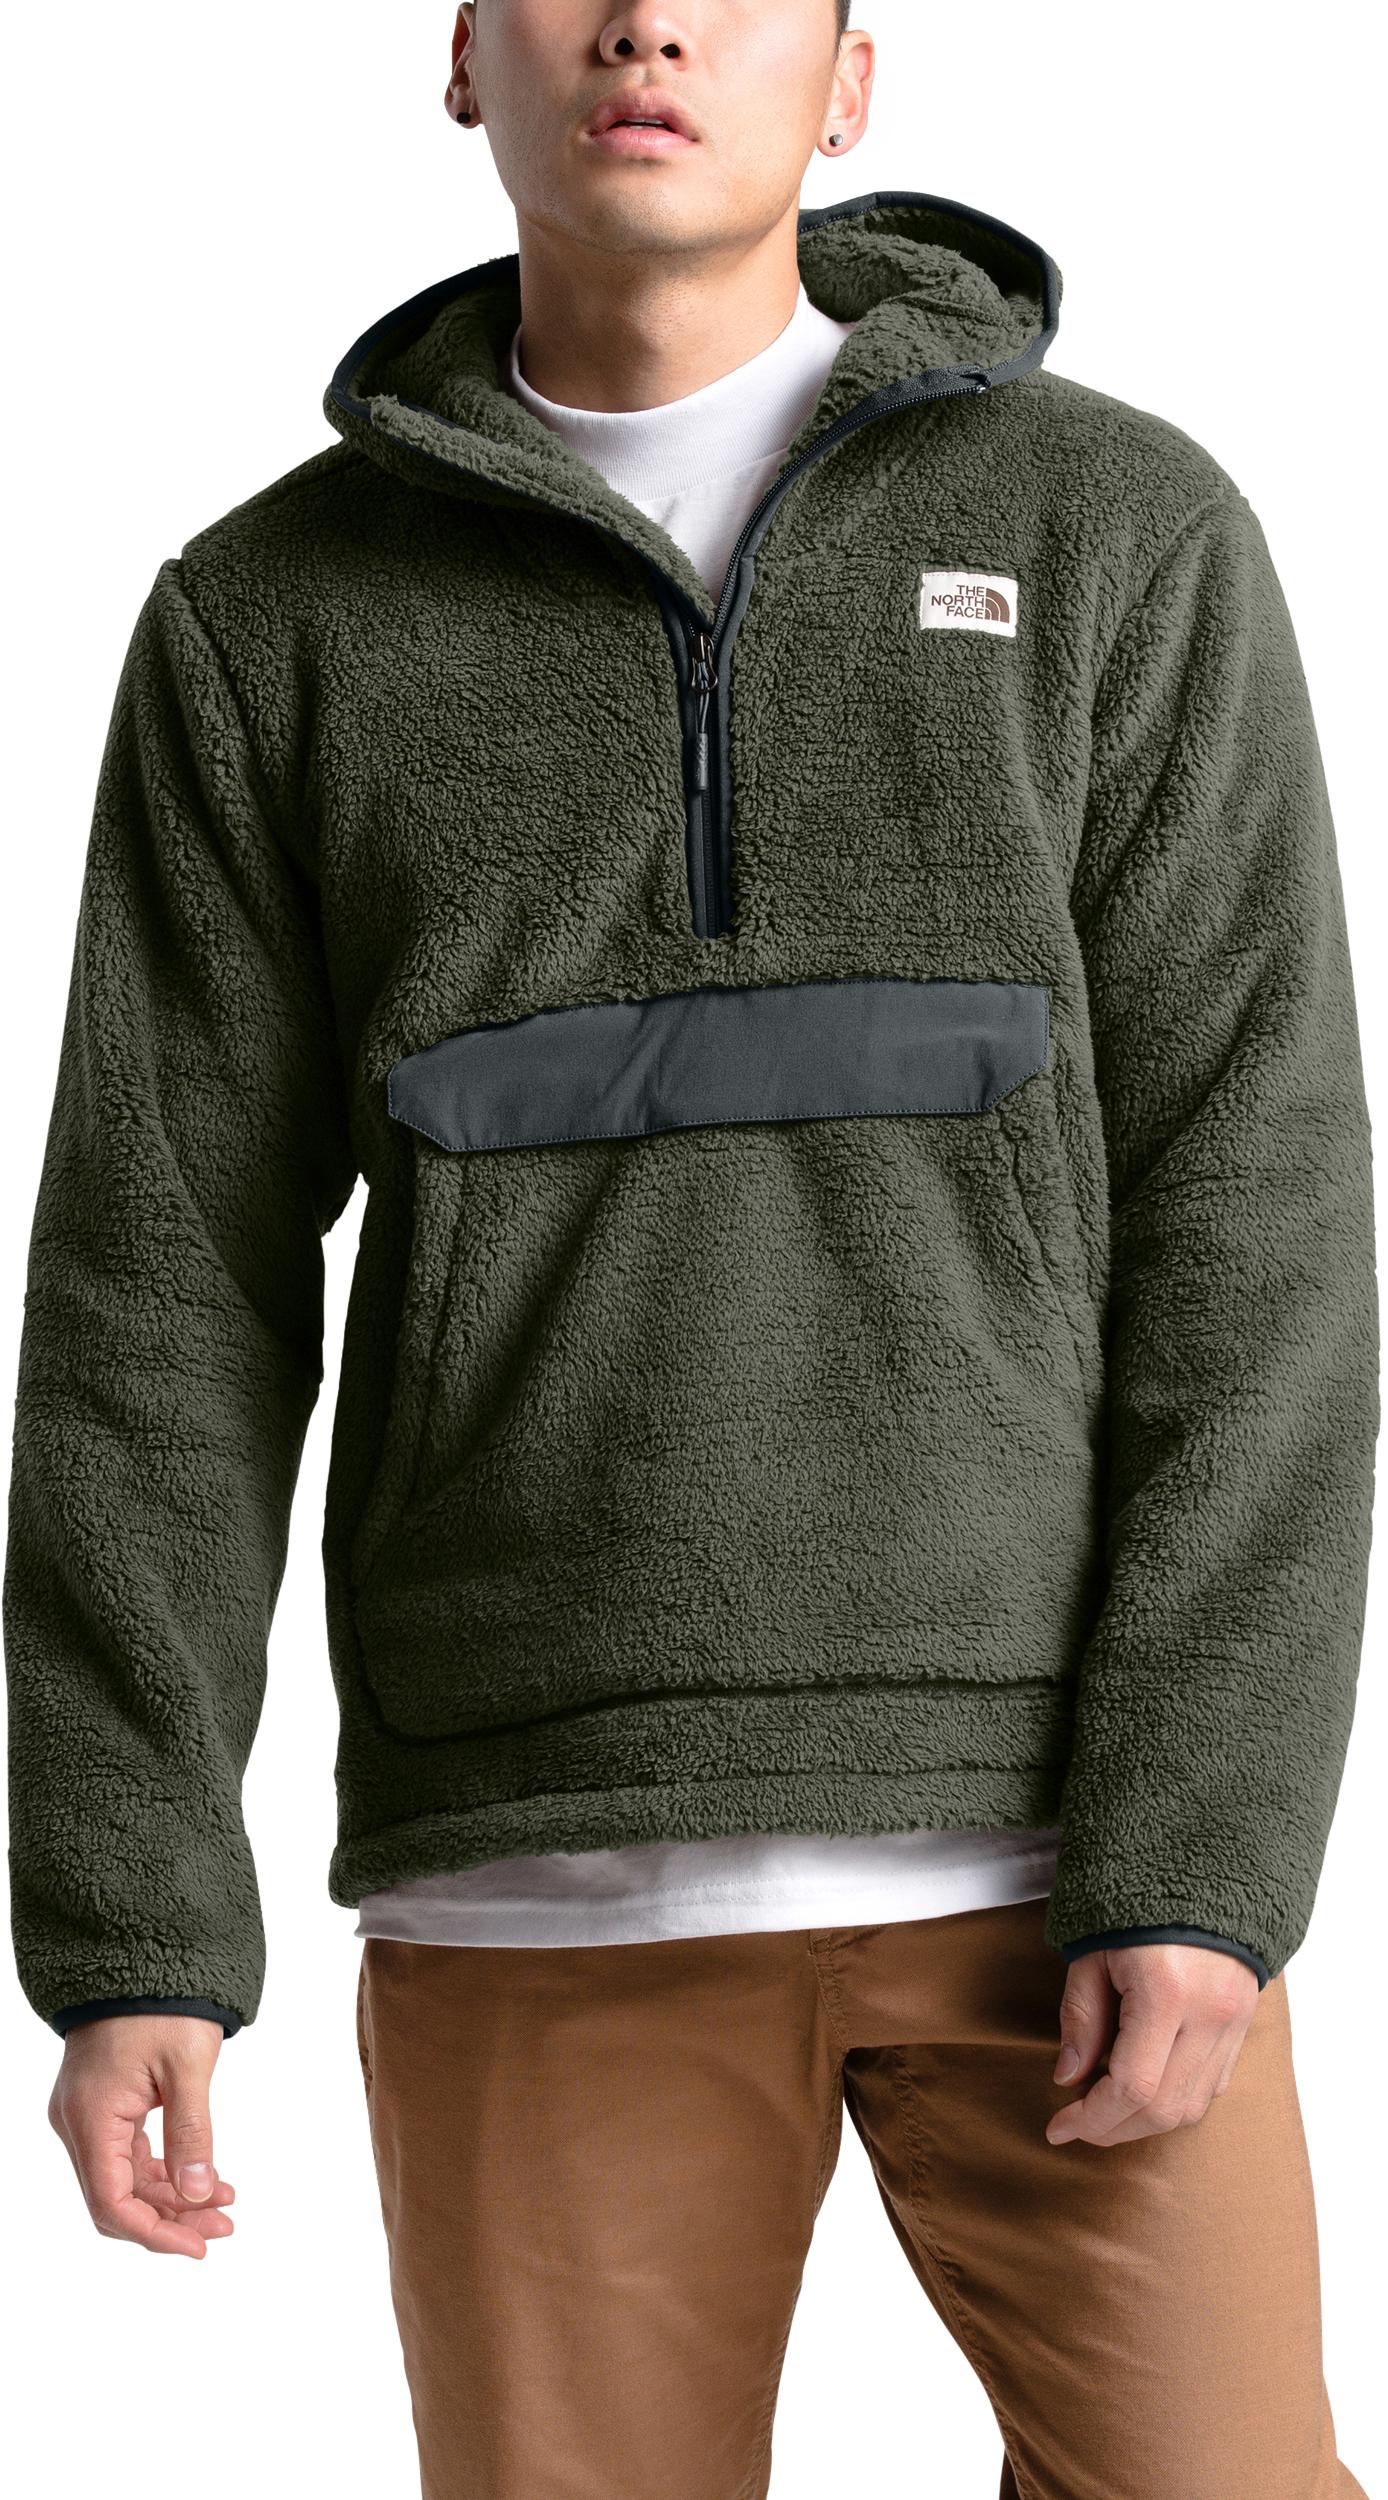 c40cef475 Fleece jackets | MEC